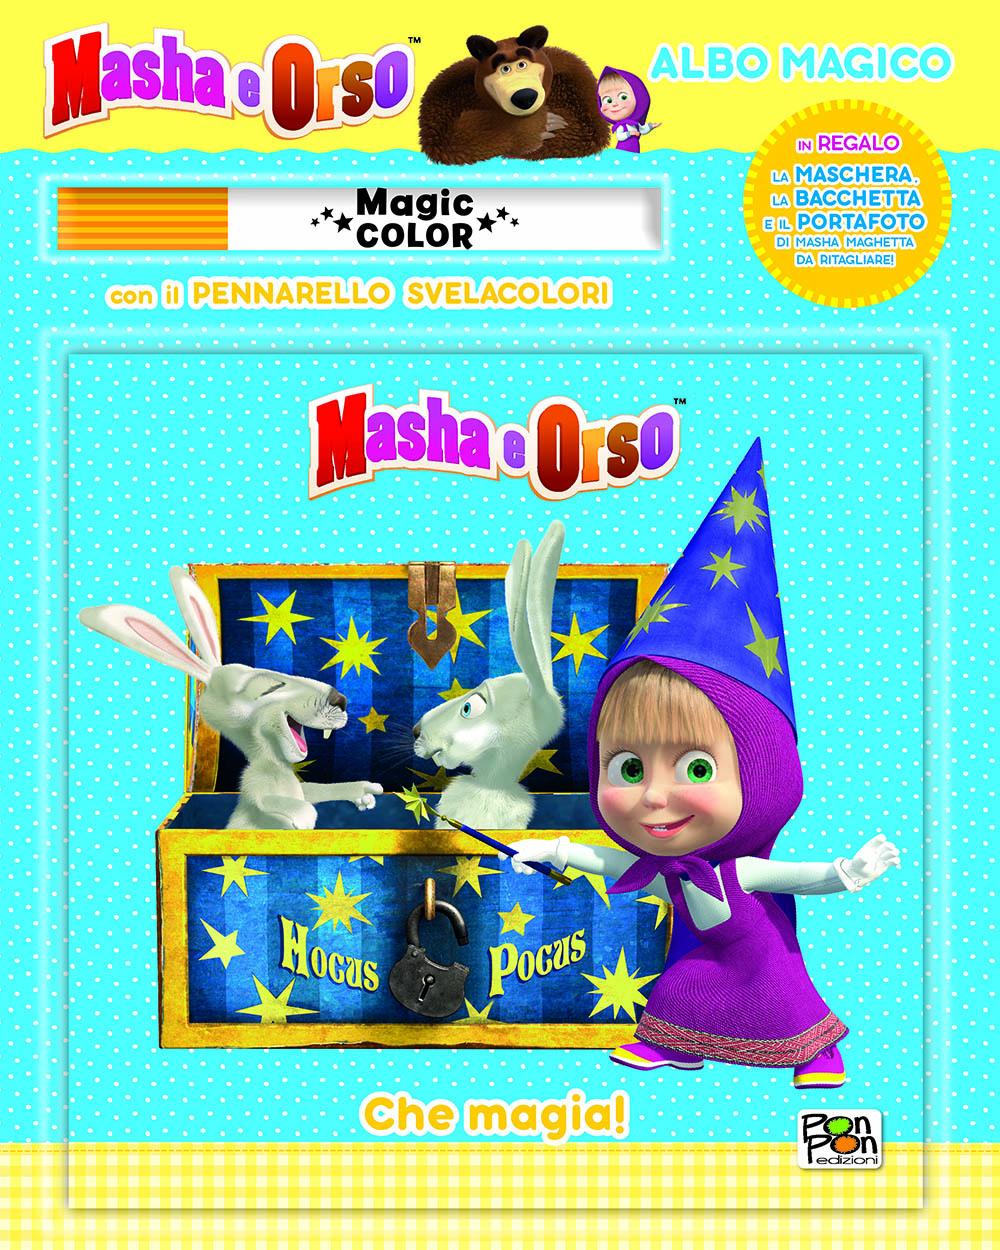 Albo Magico Masha - Che magia!